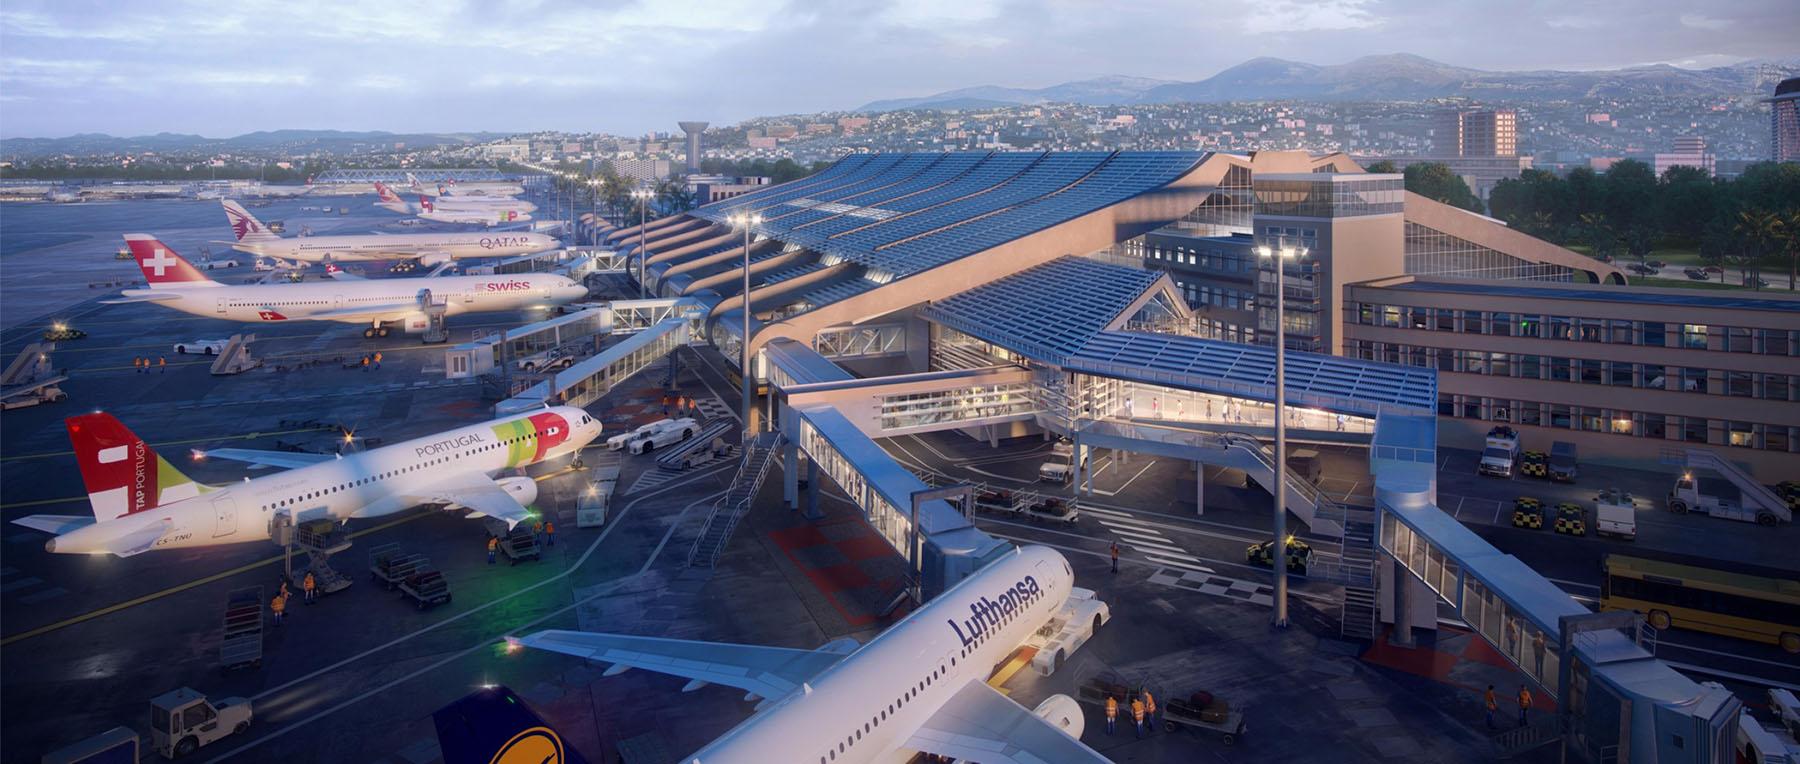 aeroport nicote azur ferme terminal 1